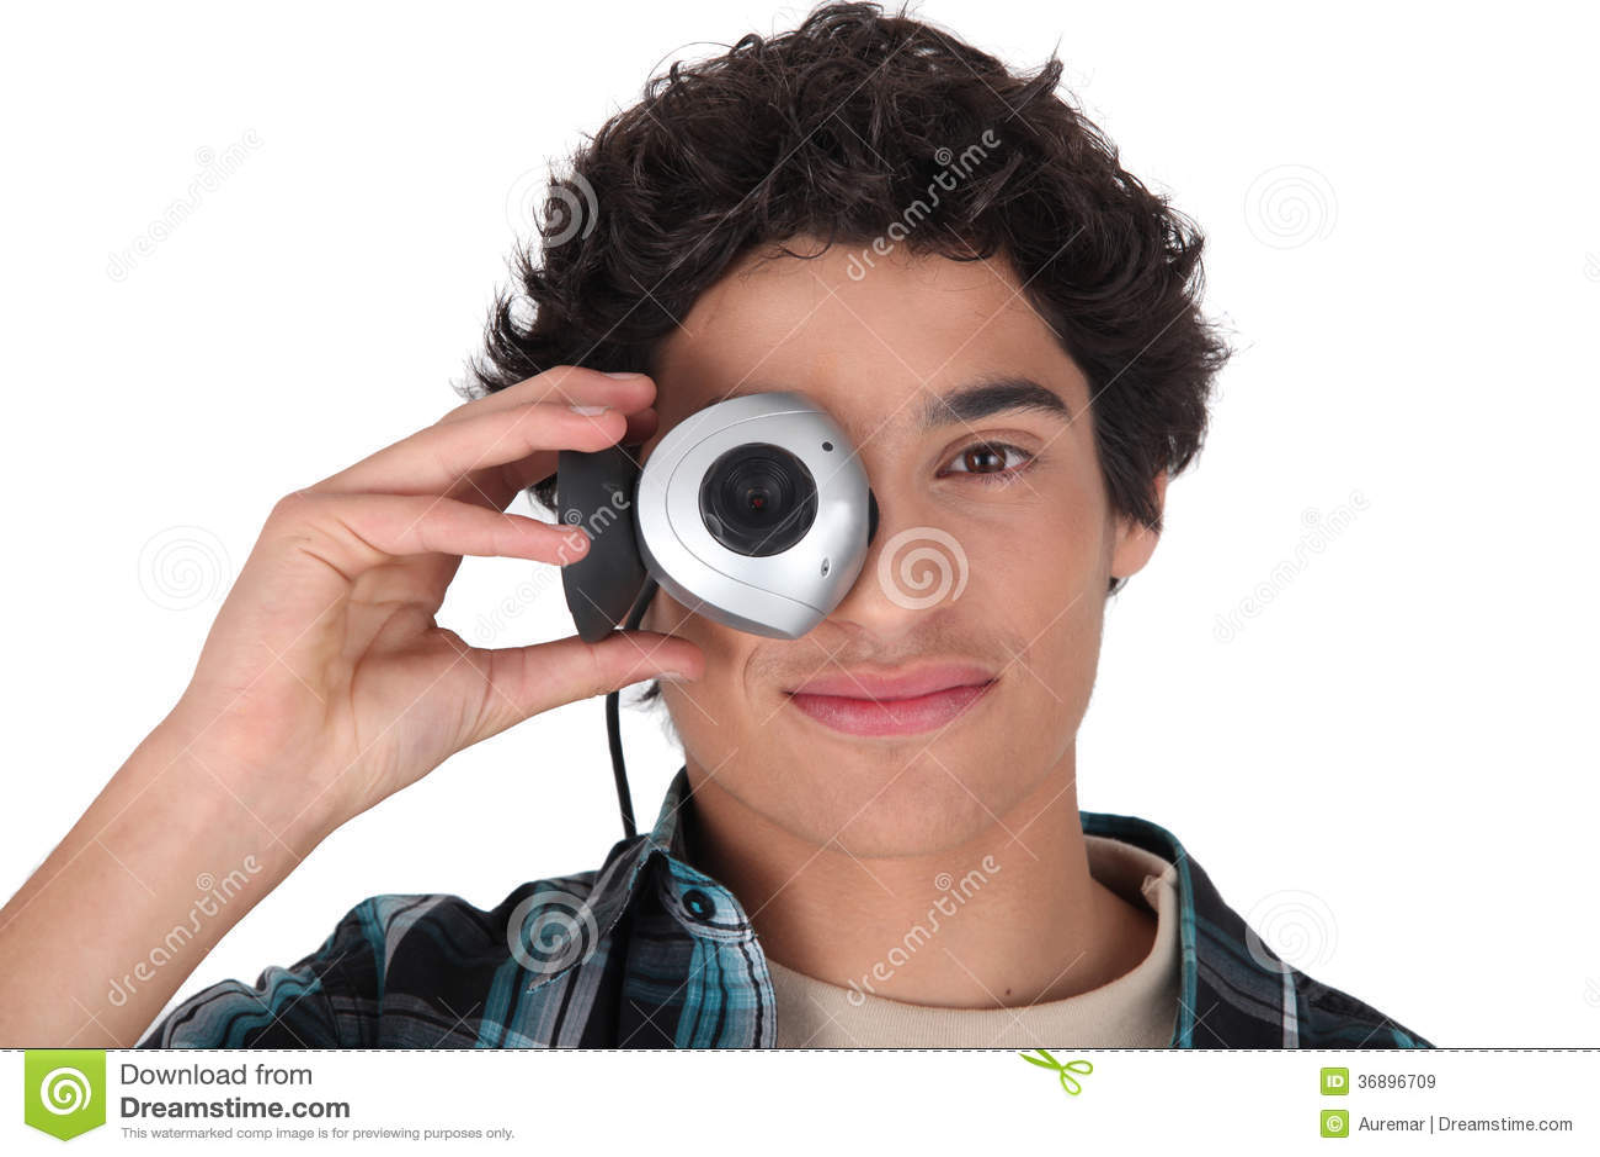 Free men webcam